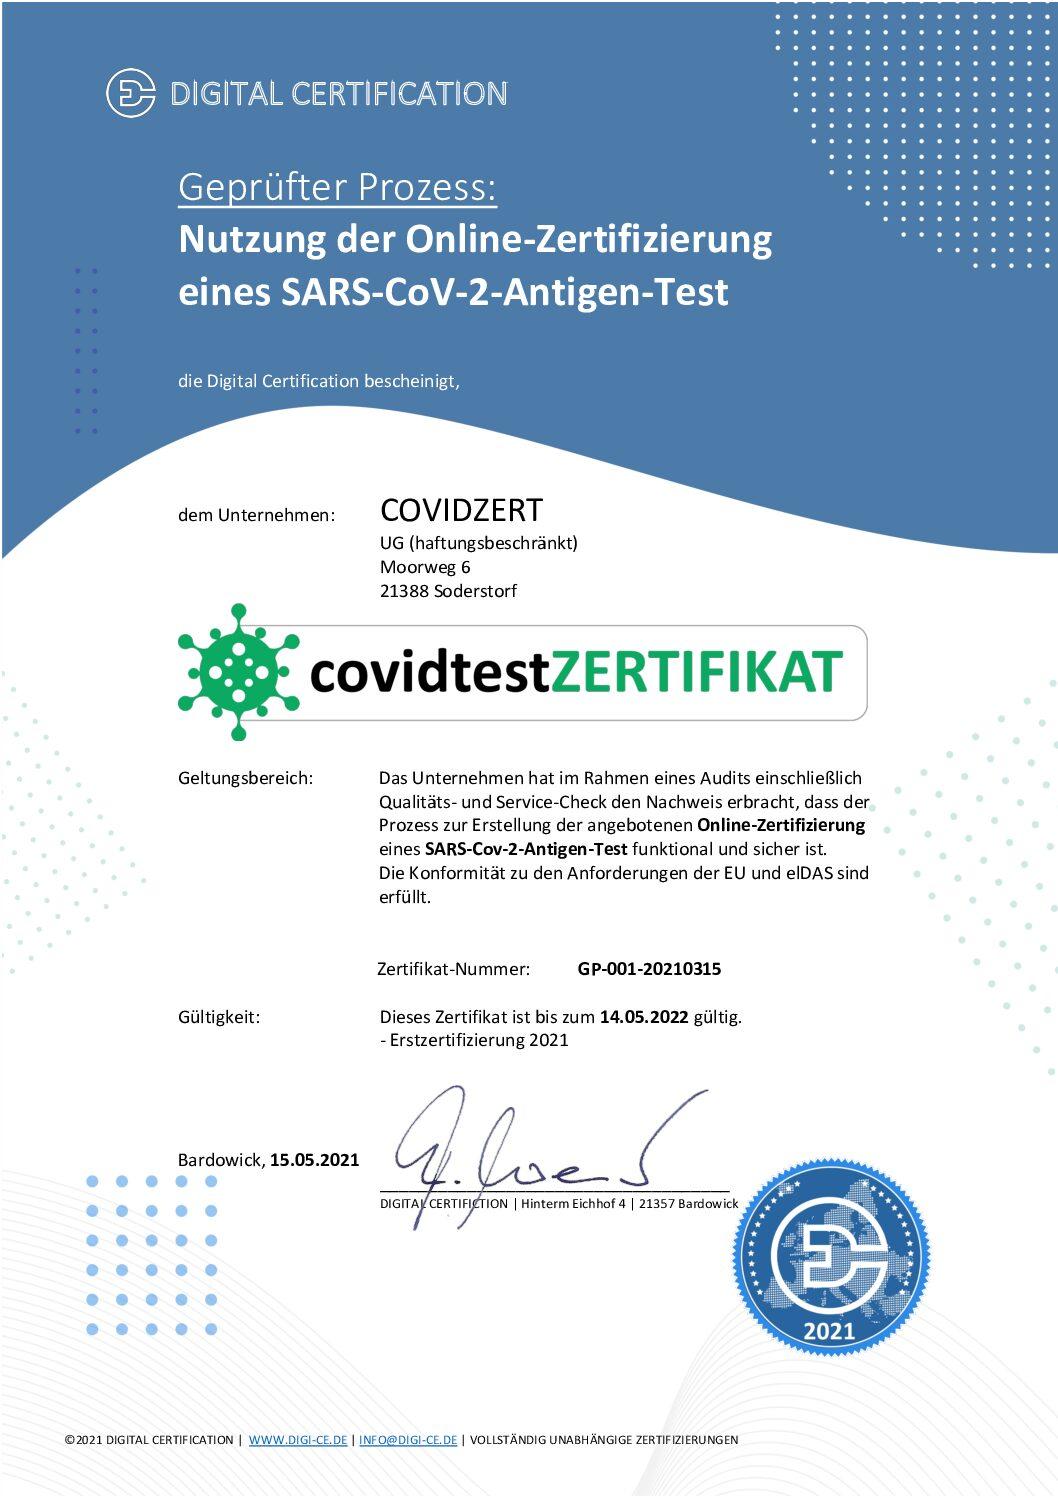 covidtestZertifikat ist anerkannt